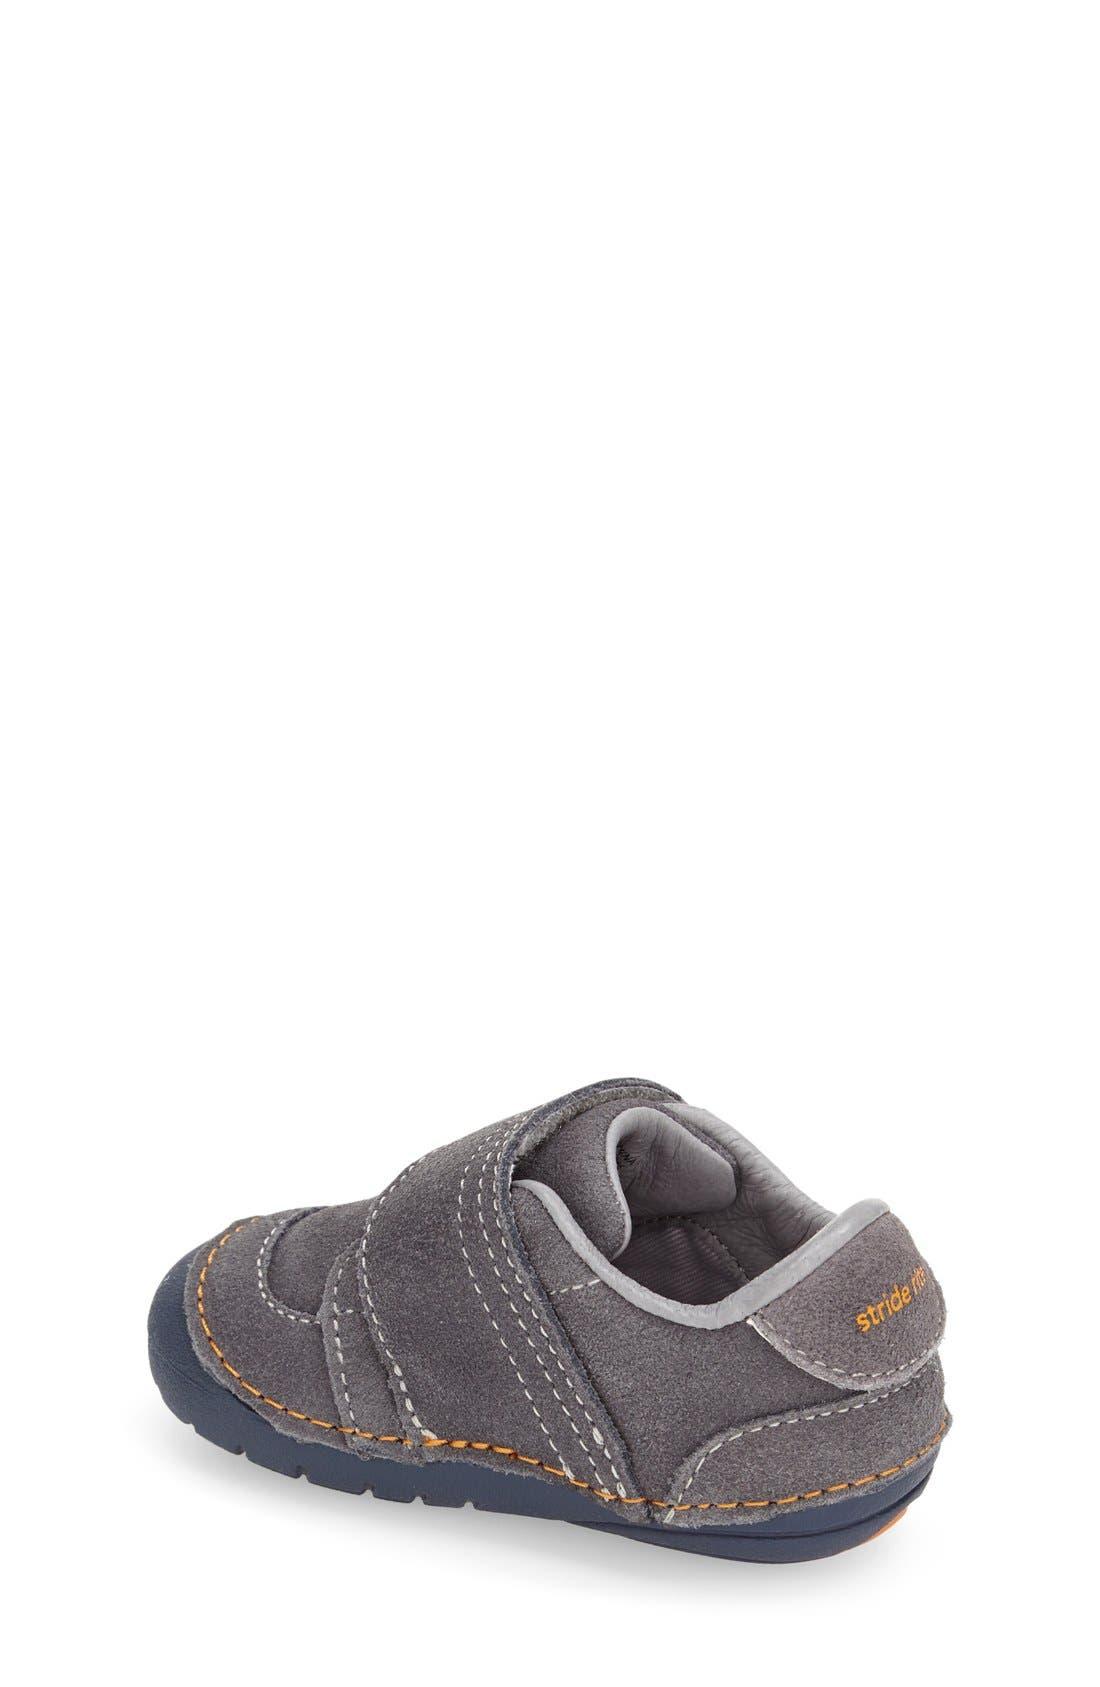 STRIDE RITE, Soft Motion Kellen Sneaker, Alternate thumbnail 2, color, GREY